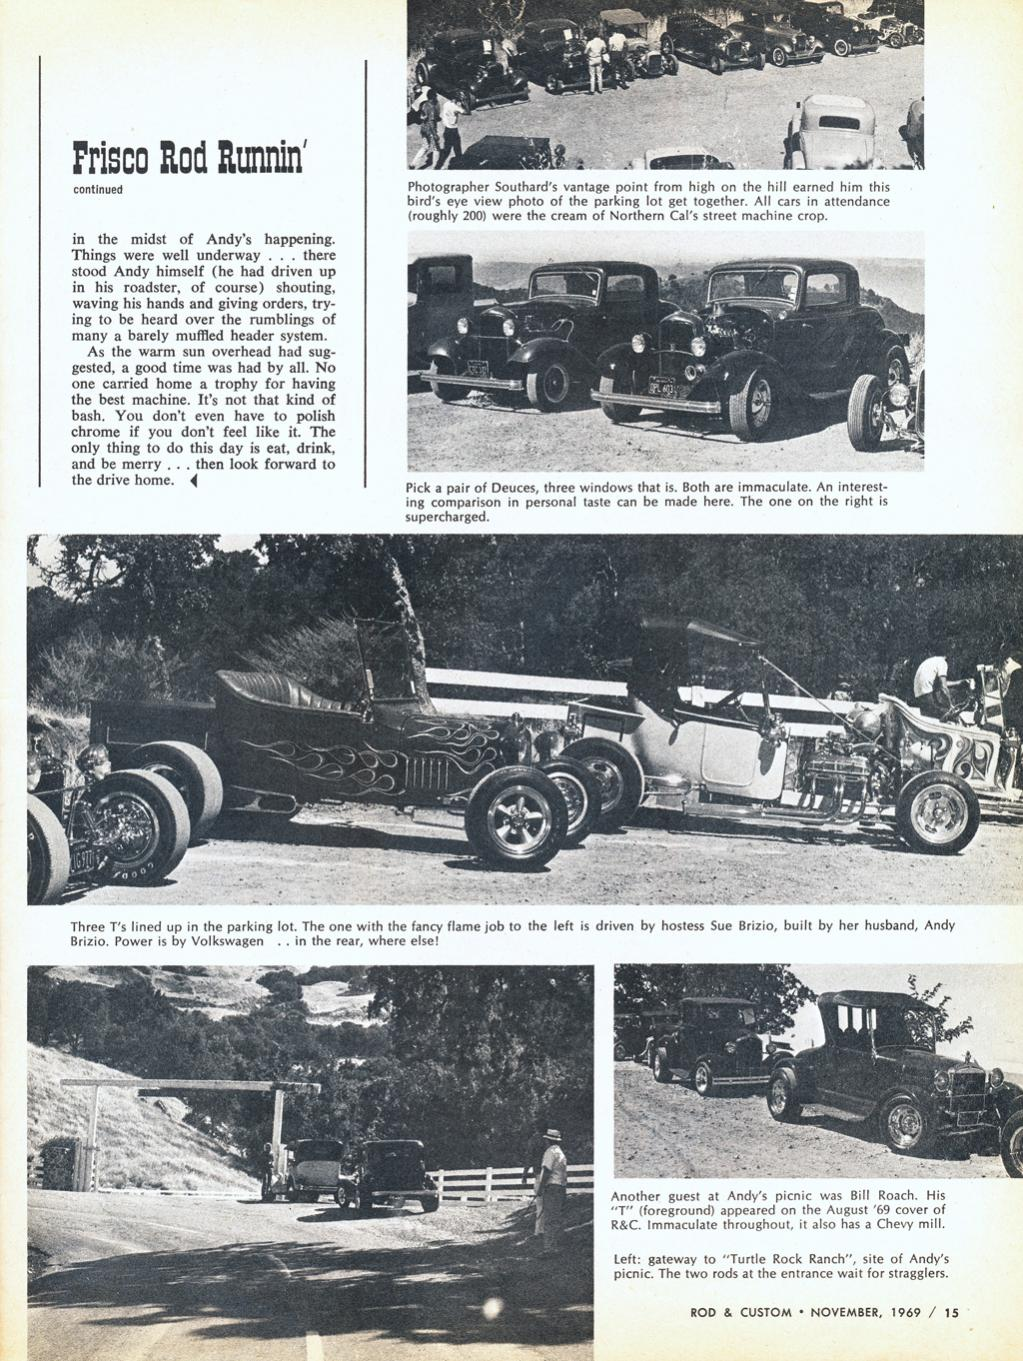 ROD&Custom - Nov '69 - pg15.jpg